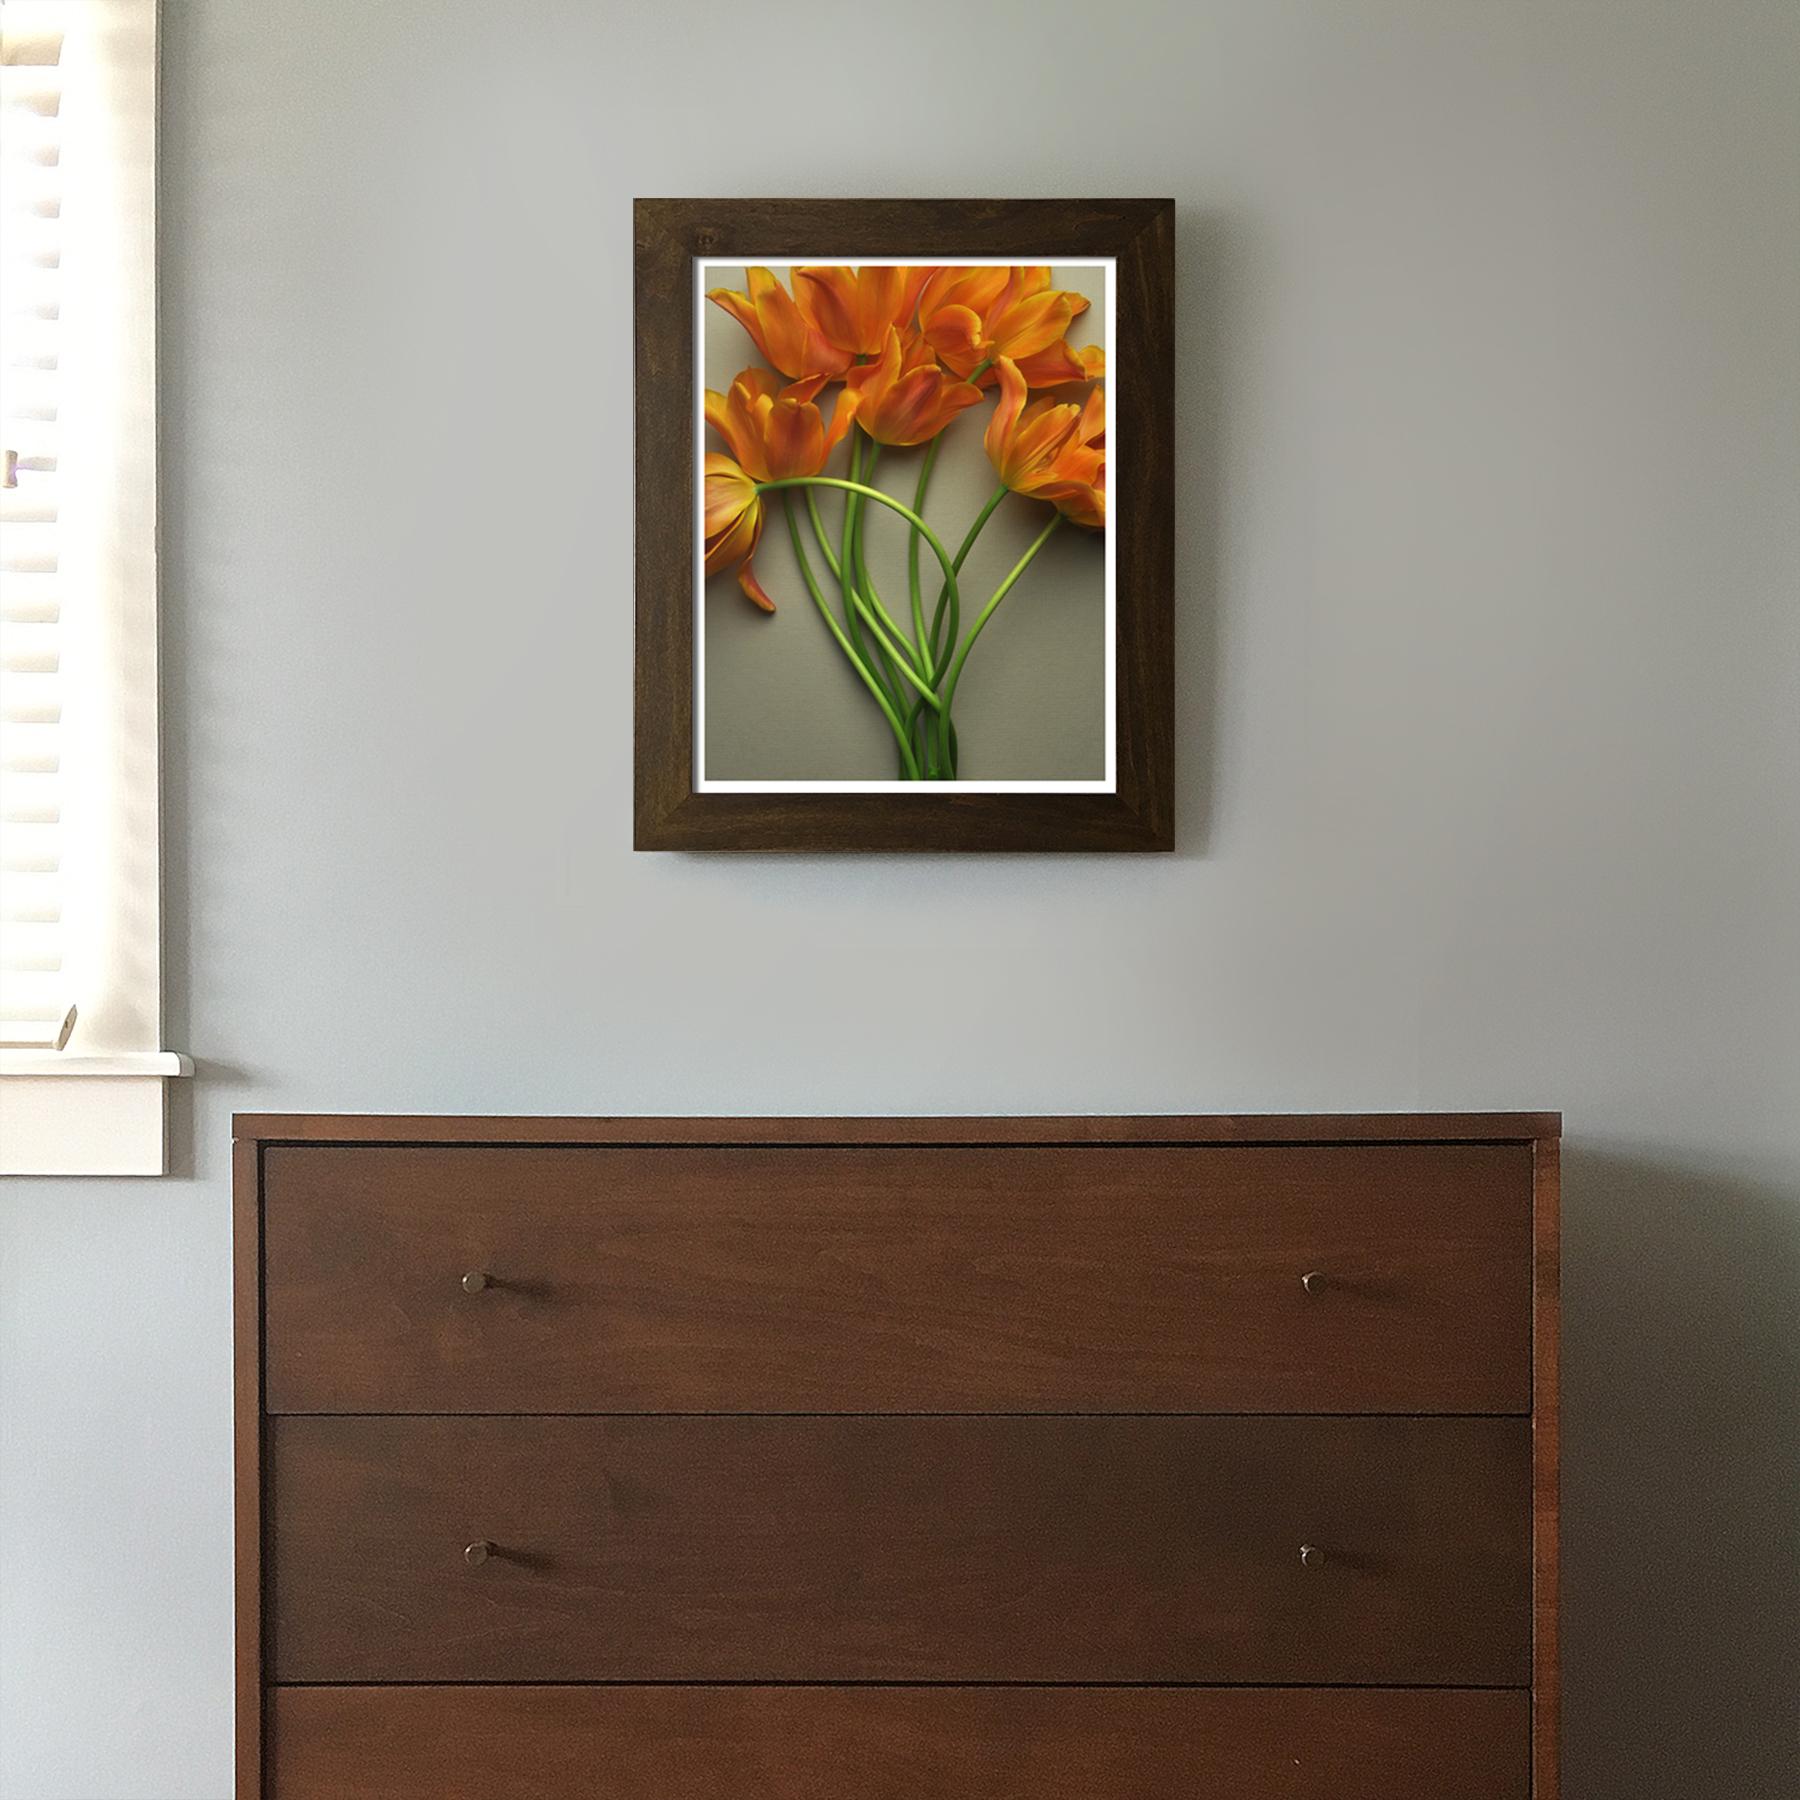 Tulips Over the Dresser